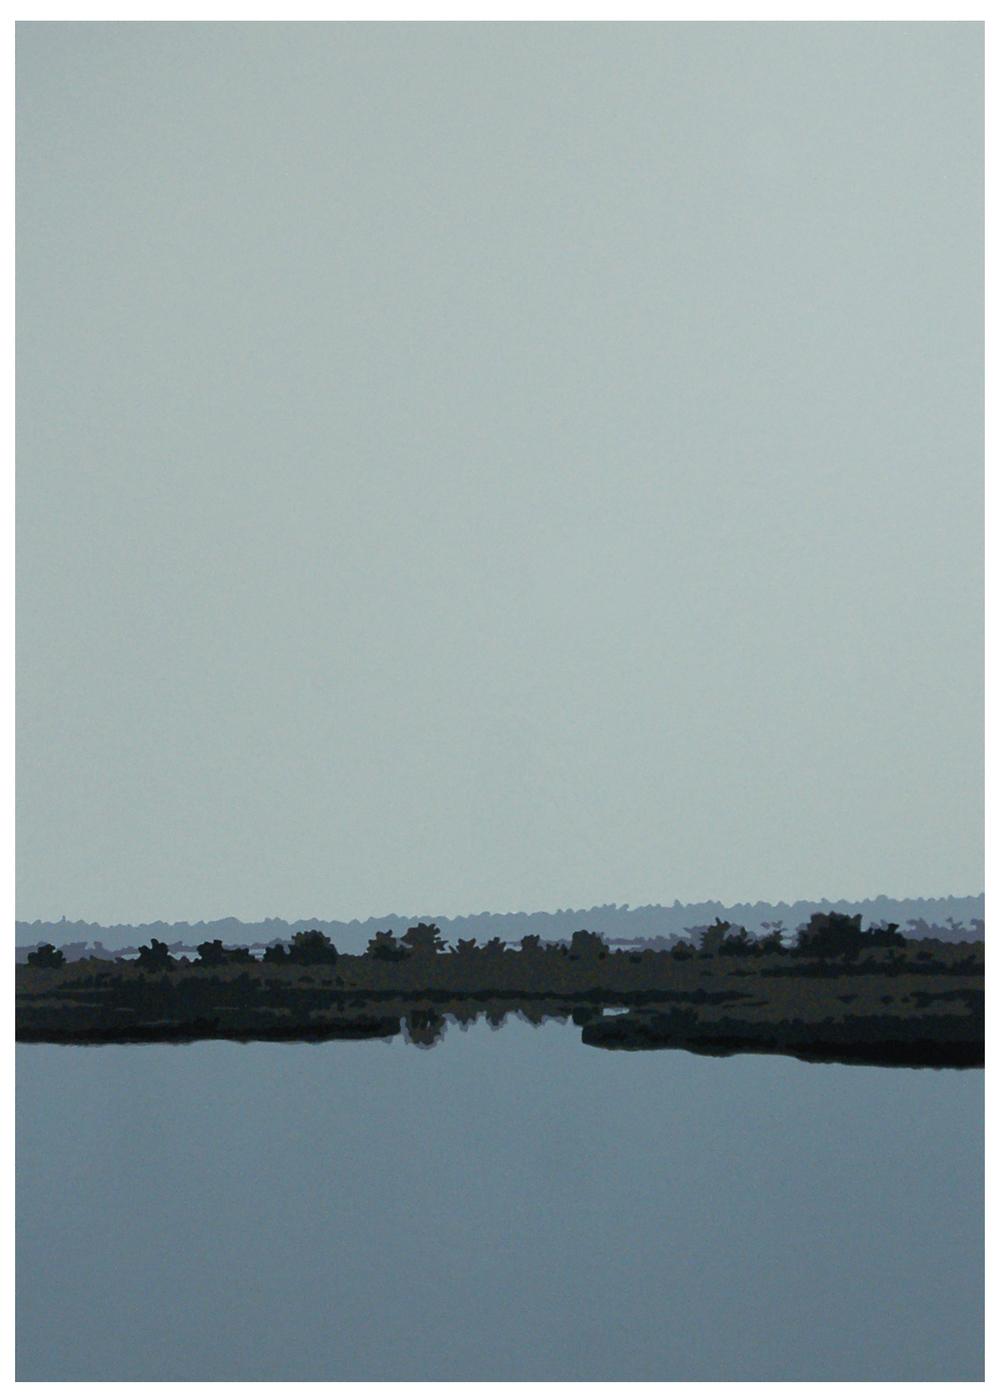 Marsh II,2007, 27x 19, Oil enamel onresin paper